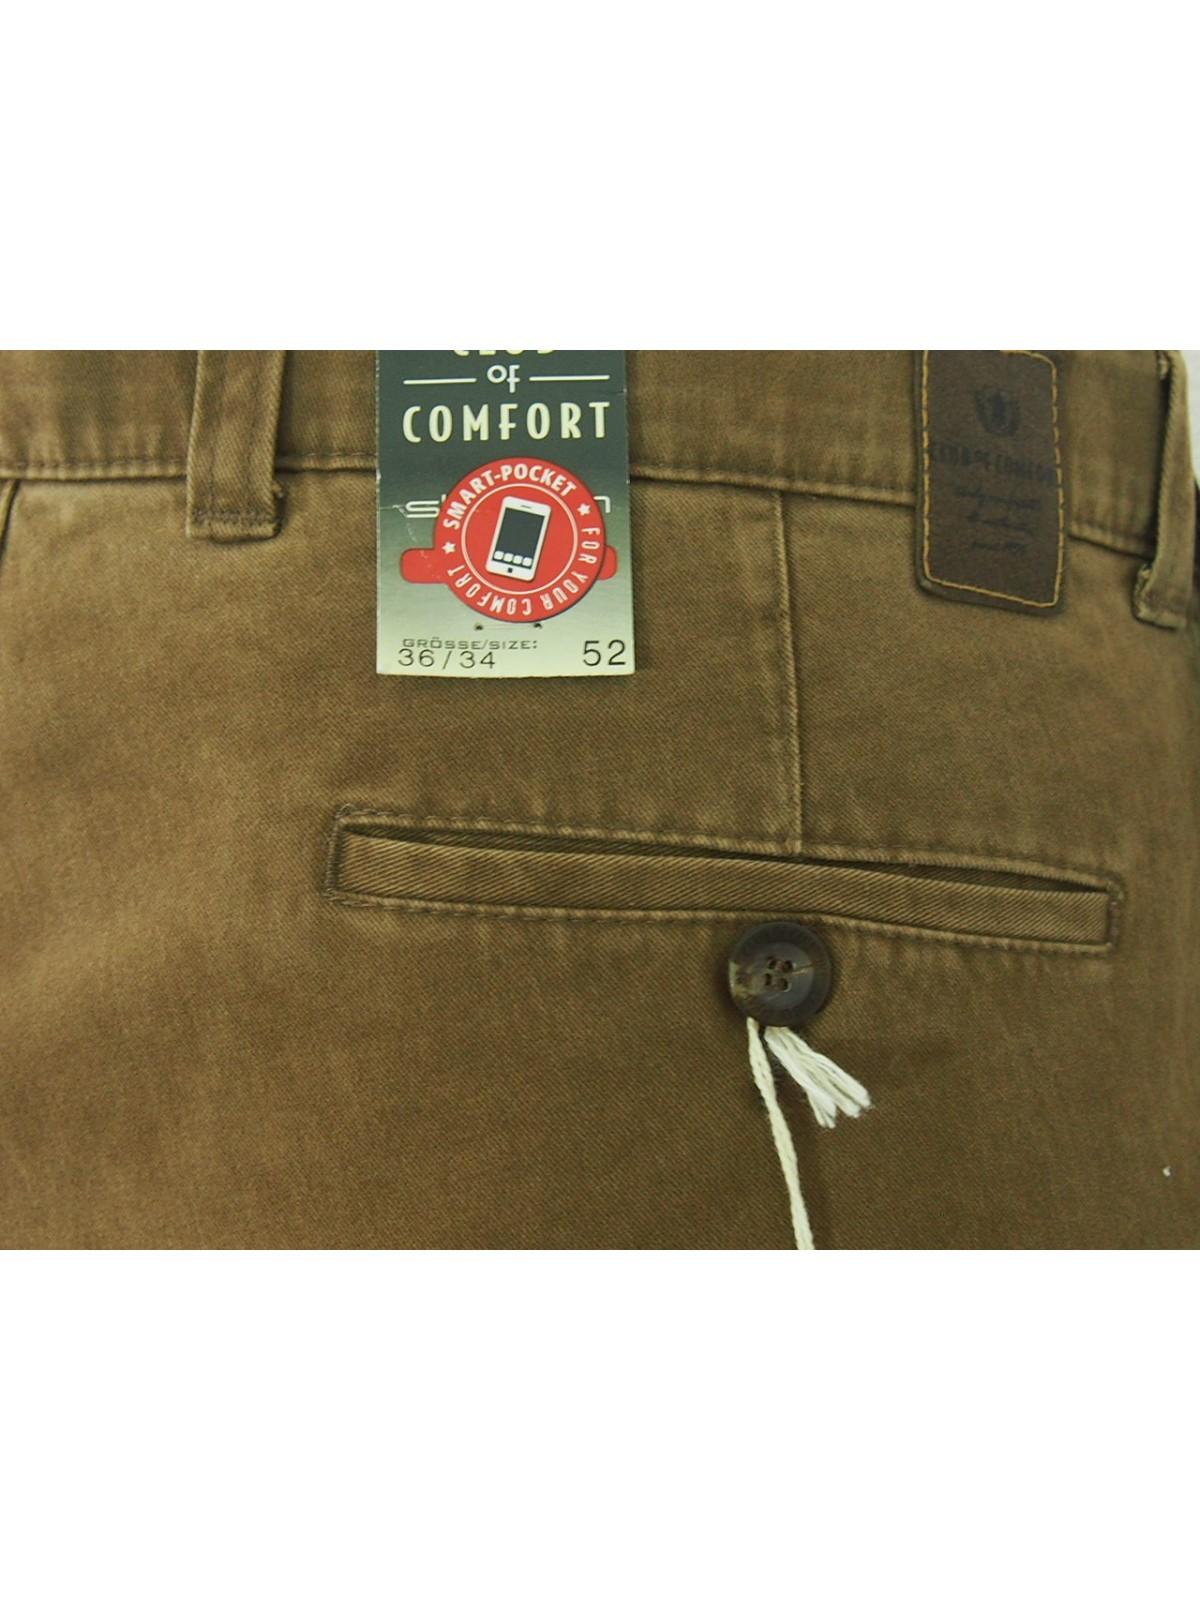 Брюки мужские Club of comfort Connor 6005 3